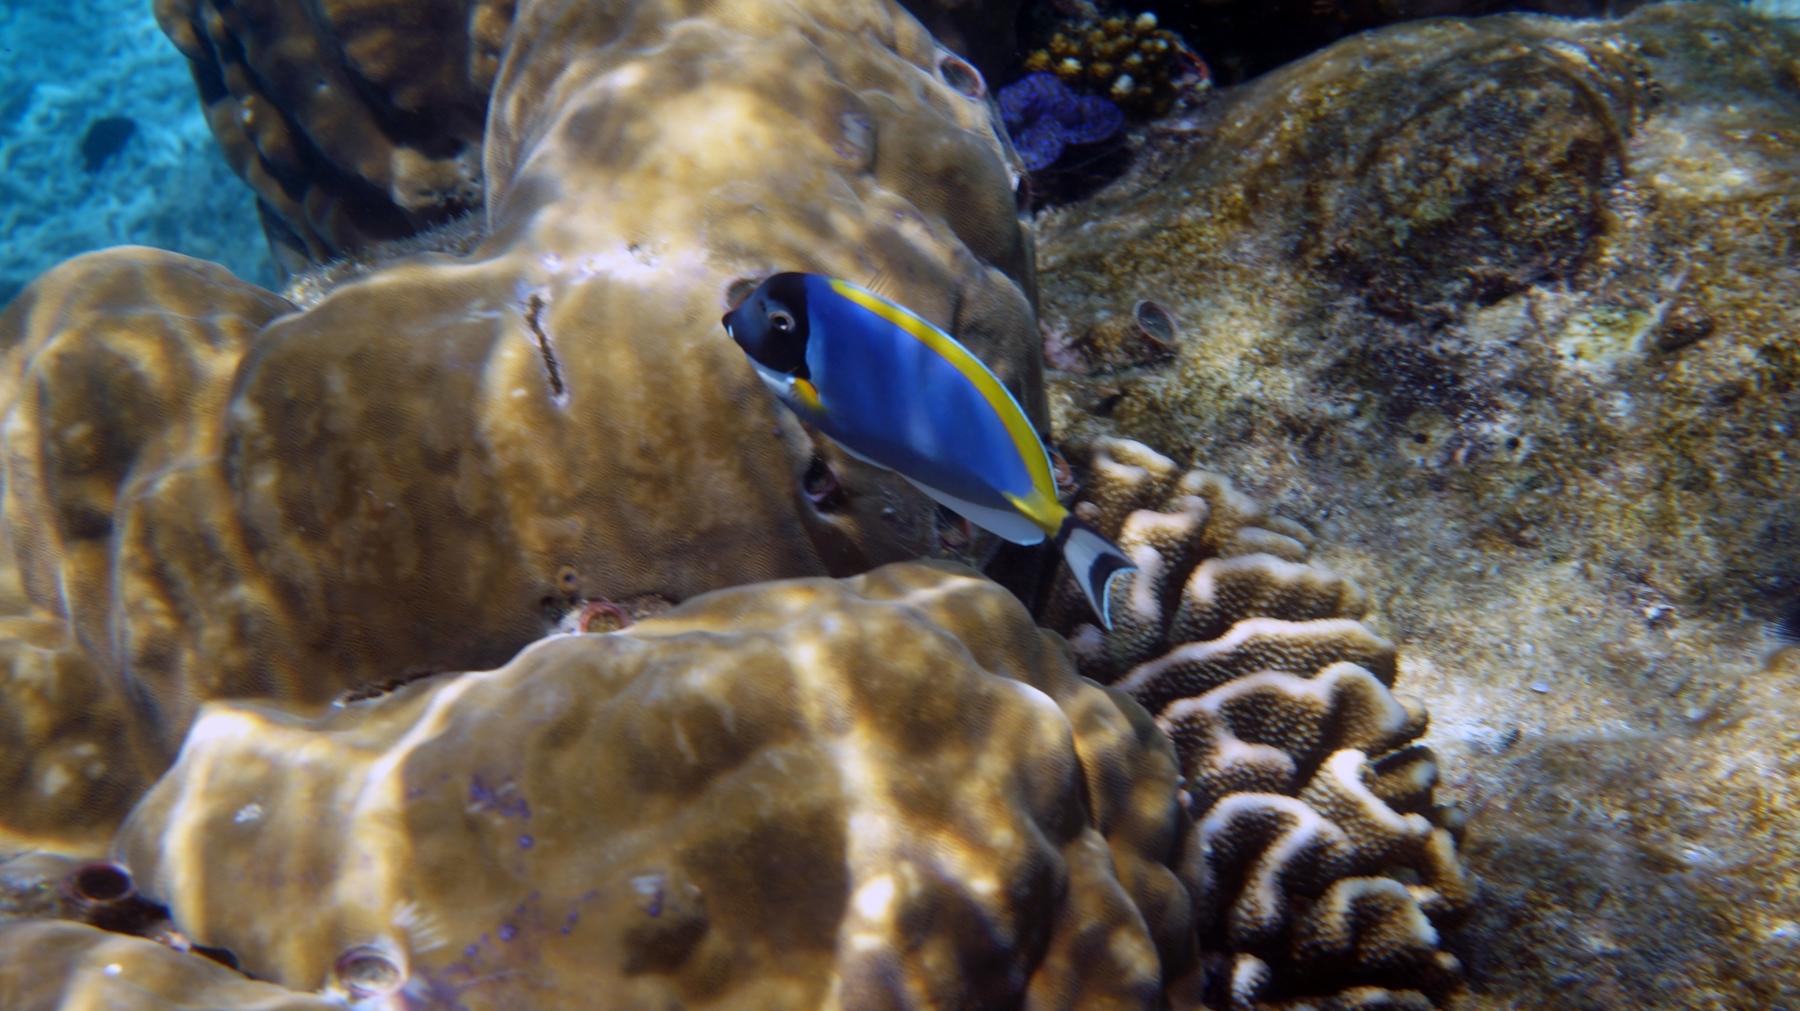 Acanthurus_leucosternon_003_C_Peces-Cirujano_L_Maldivas_U_Sebas_30062015